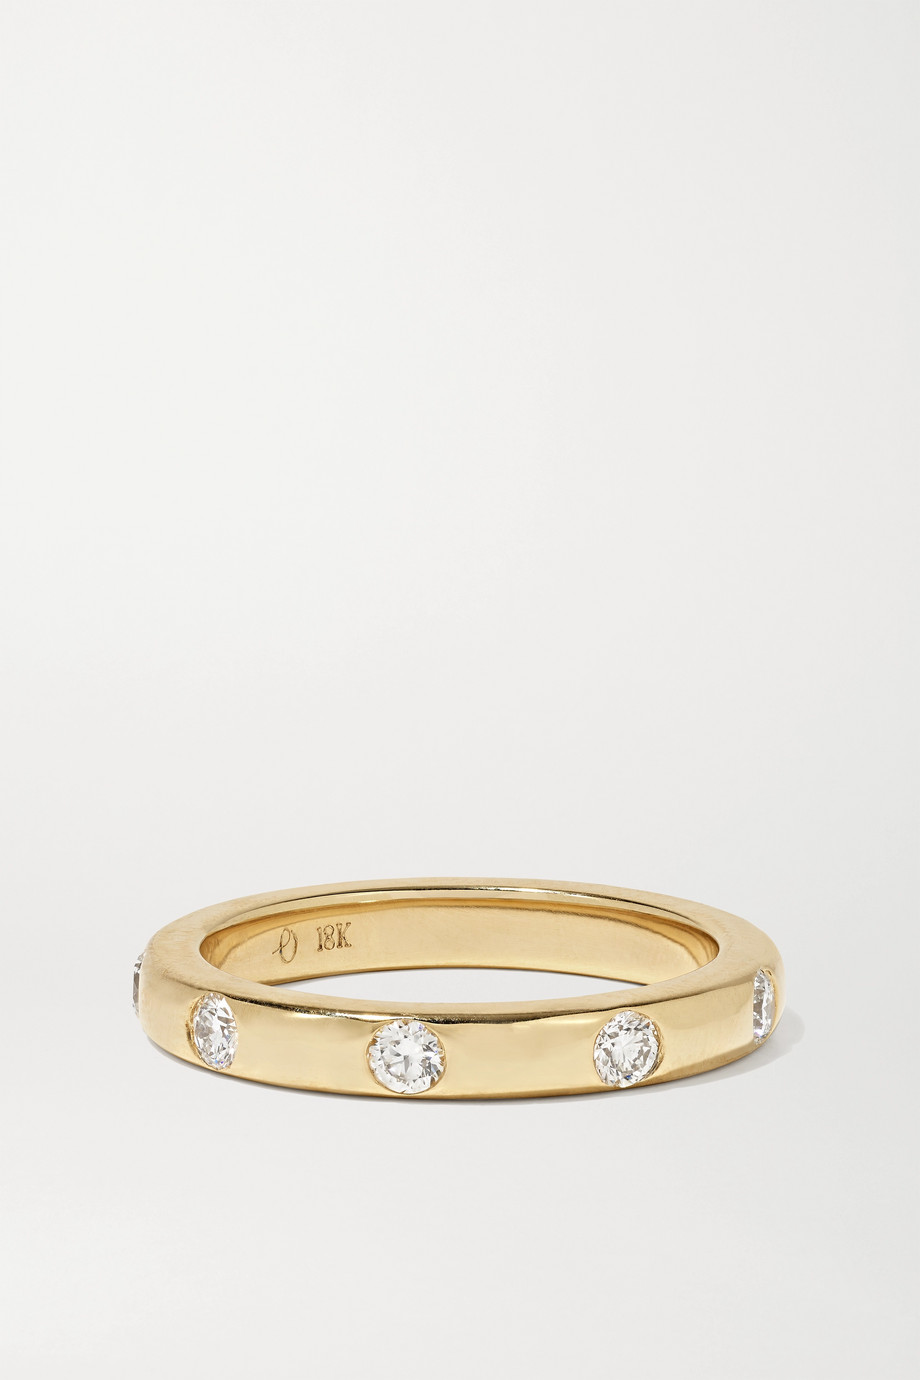 Octavia Elizabeth + NET SUSTAIN Ivy 18-karat gold diamond ring